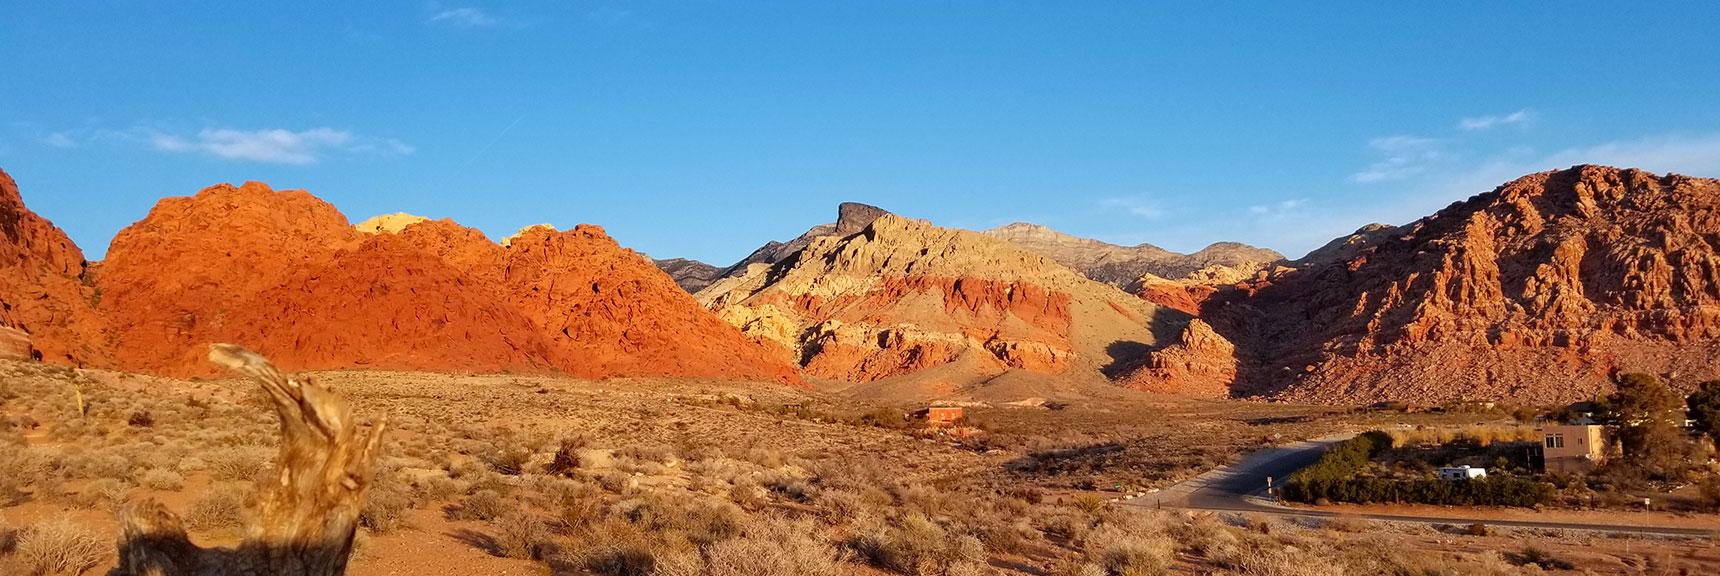 Long View of Calico Basin Northwest of Las Vegas, Nevada